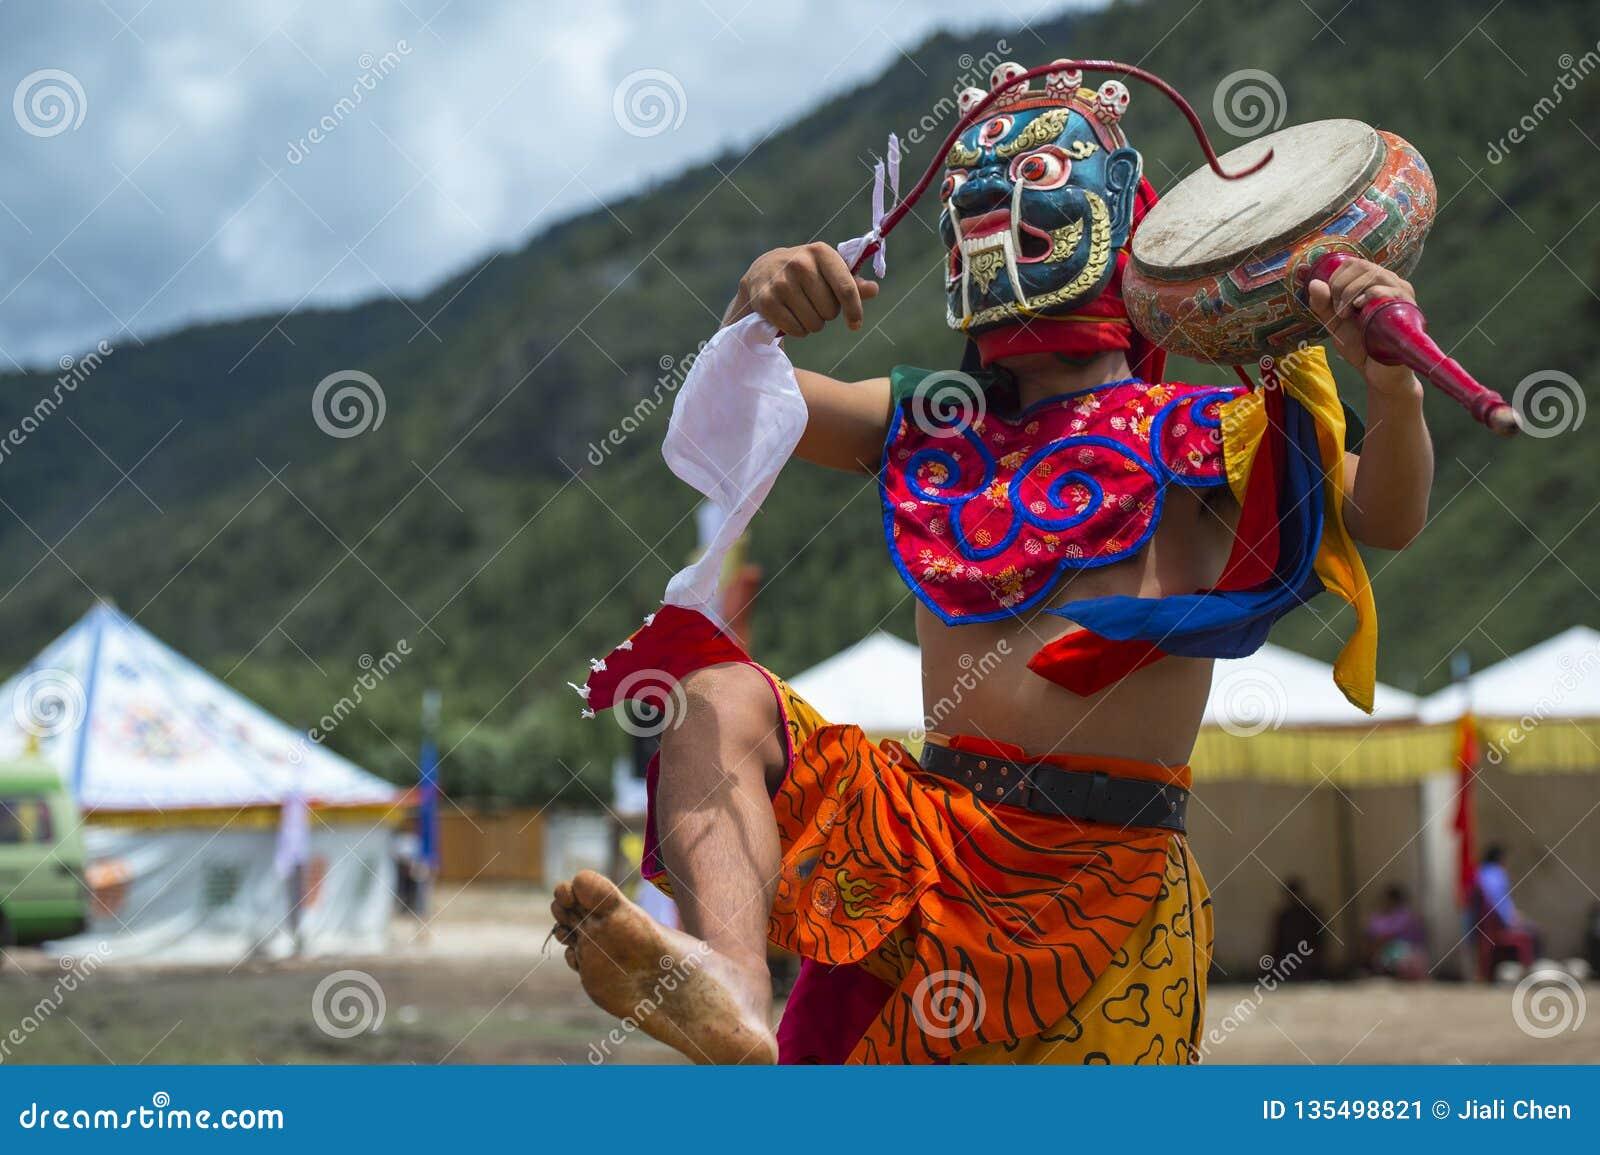 Божество протектора буддизма барабаня и танцуя, танец маски Cham, Бутан